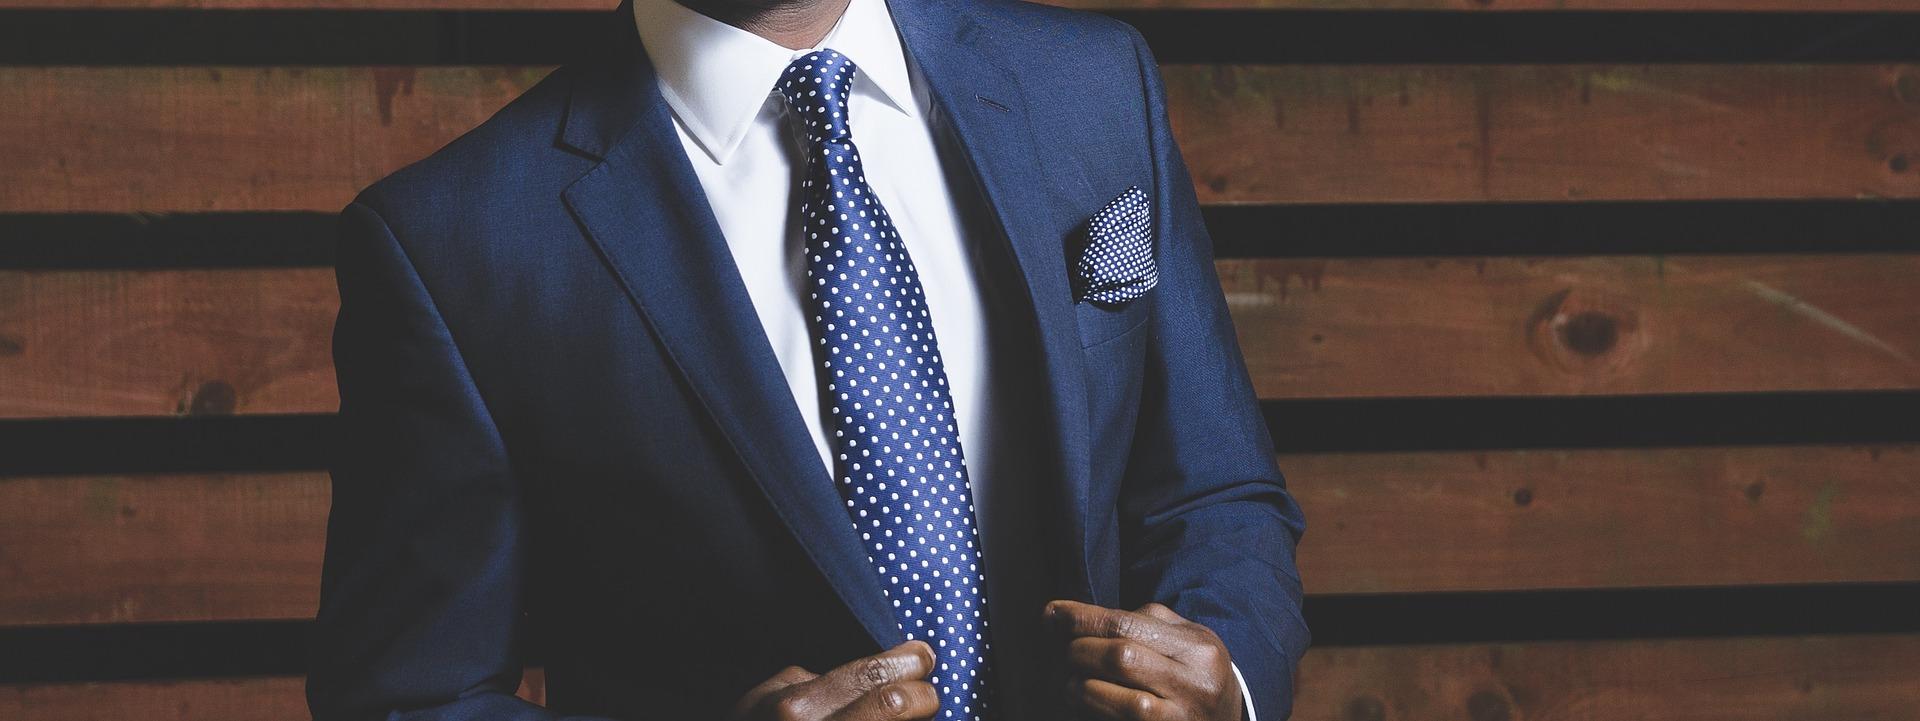 trajes de moda para hombre